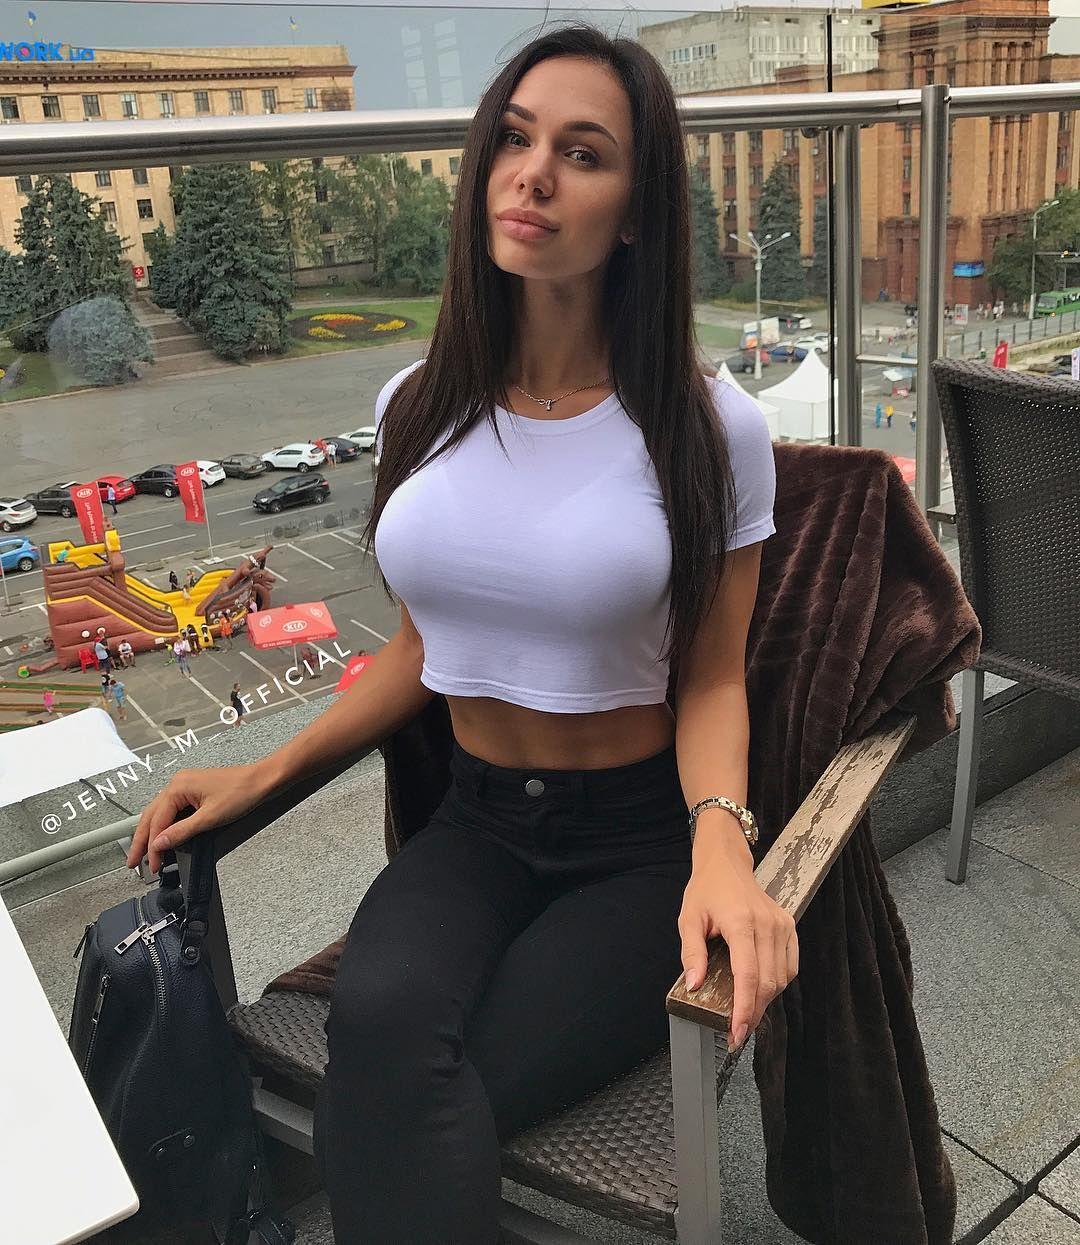 Bikini Evgeniya Podberezkina nudes (91 photo), Tits, Sideboobs, Twitter, lingerie 2020